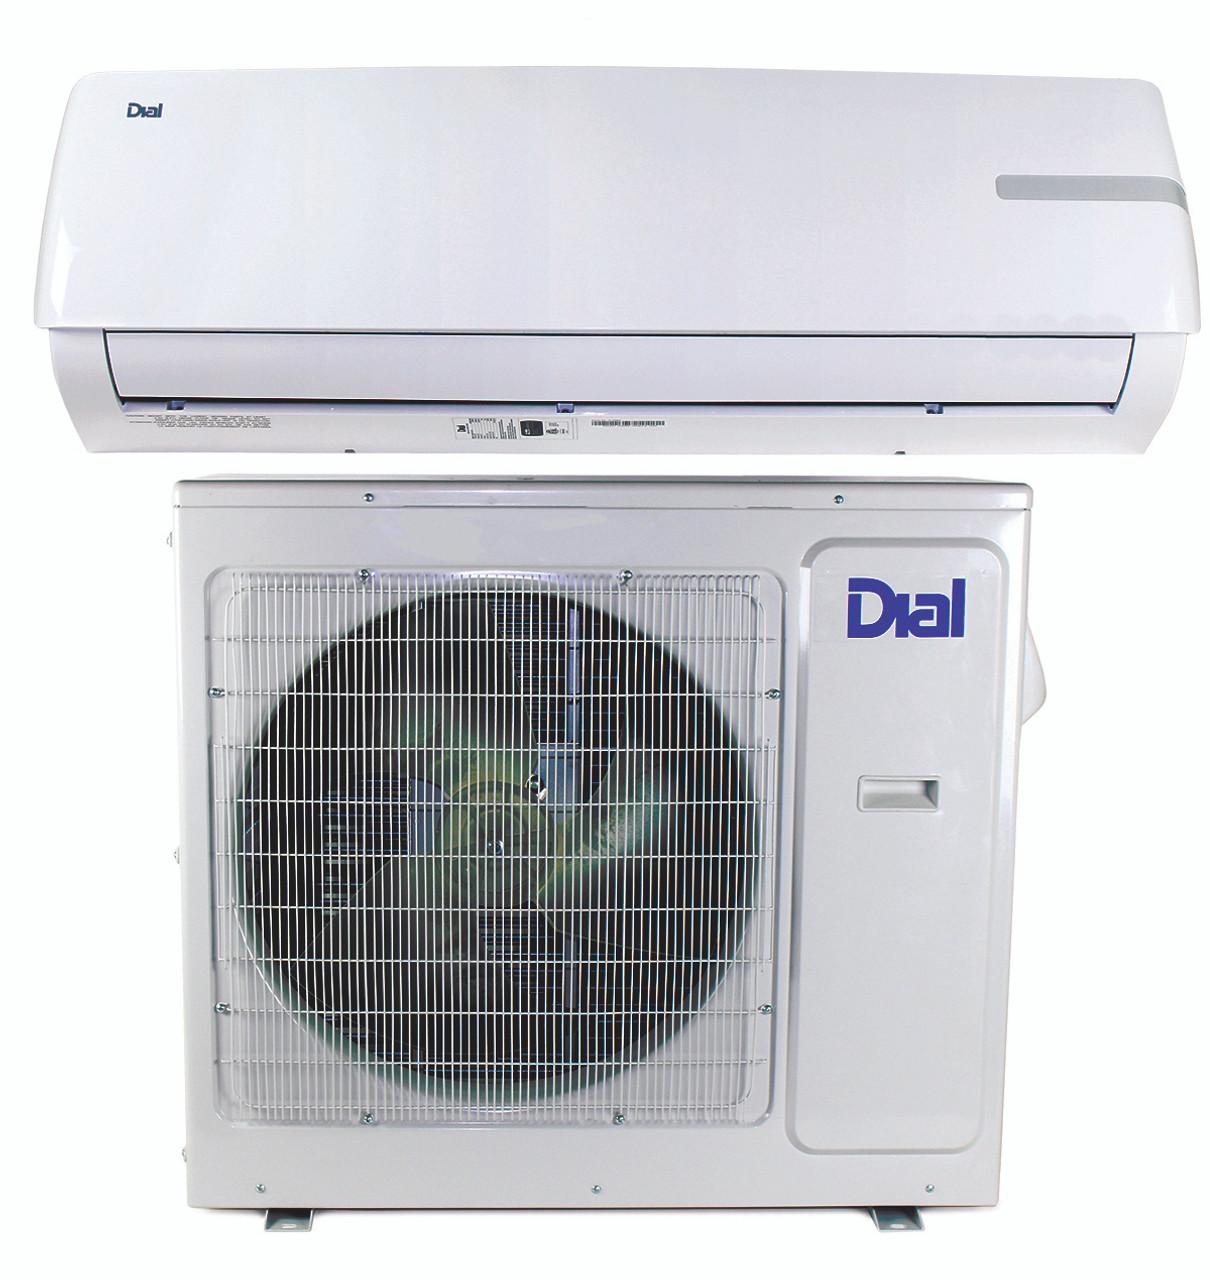 Ductless Mini Split Air Conditioner And Heat Pump 24 000 Btu 21